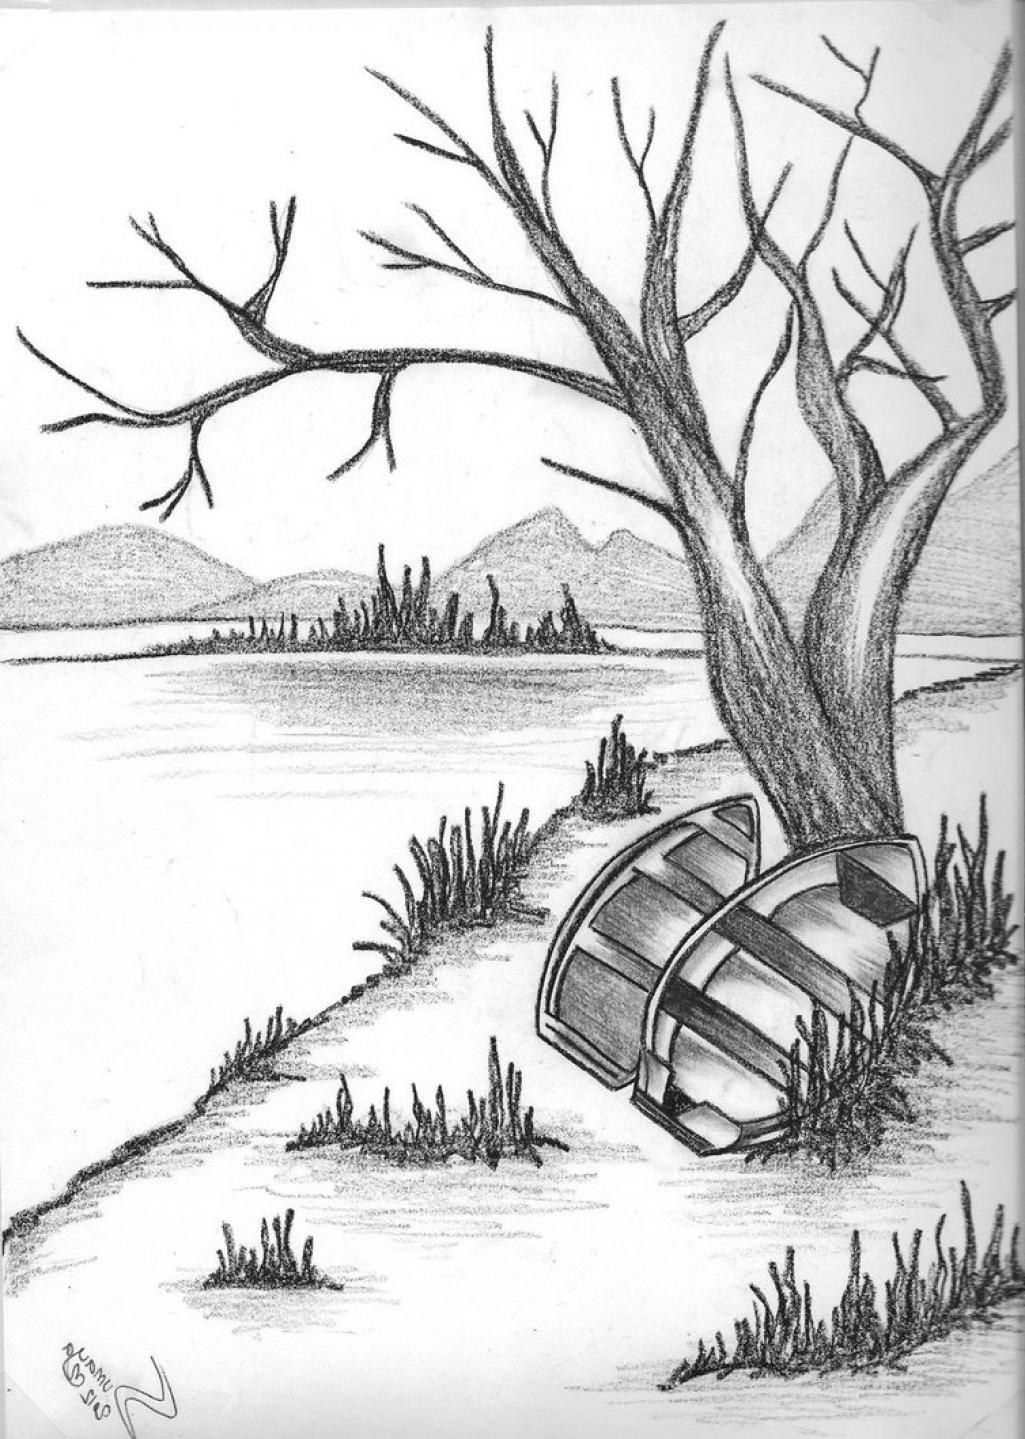 1025x1439 World Paintings Best Pencil Best Of Simple Pencil Sketch